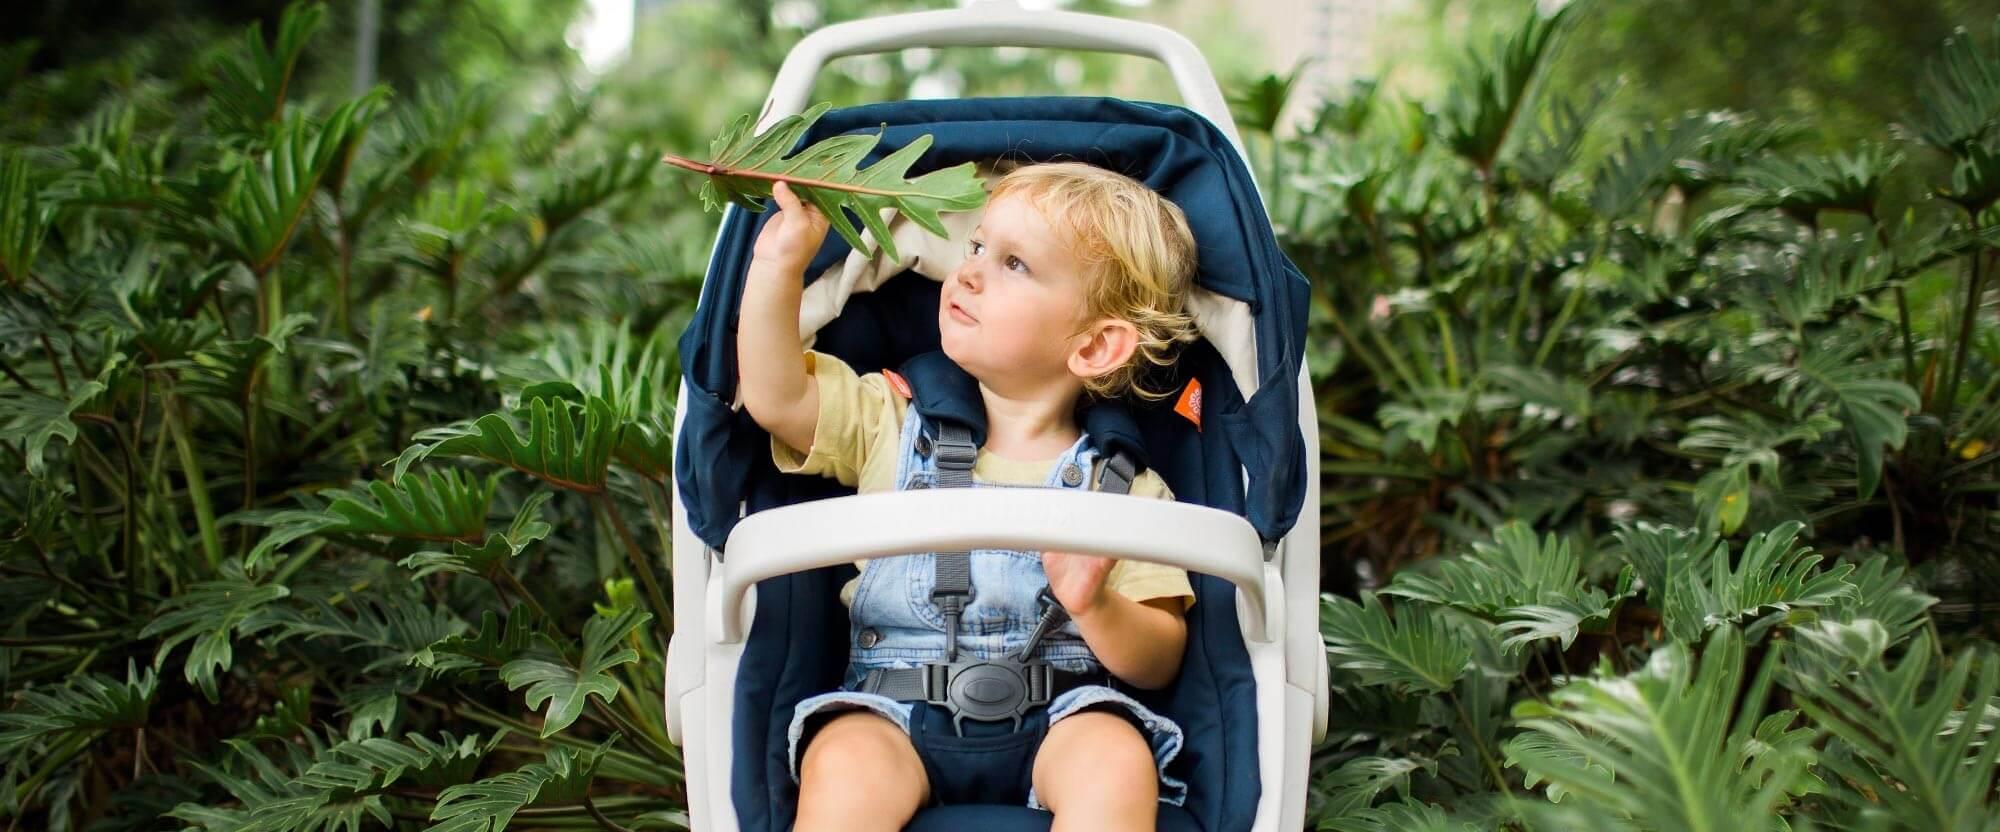 greentom-stroller-baby-leaf